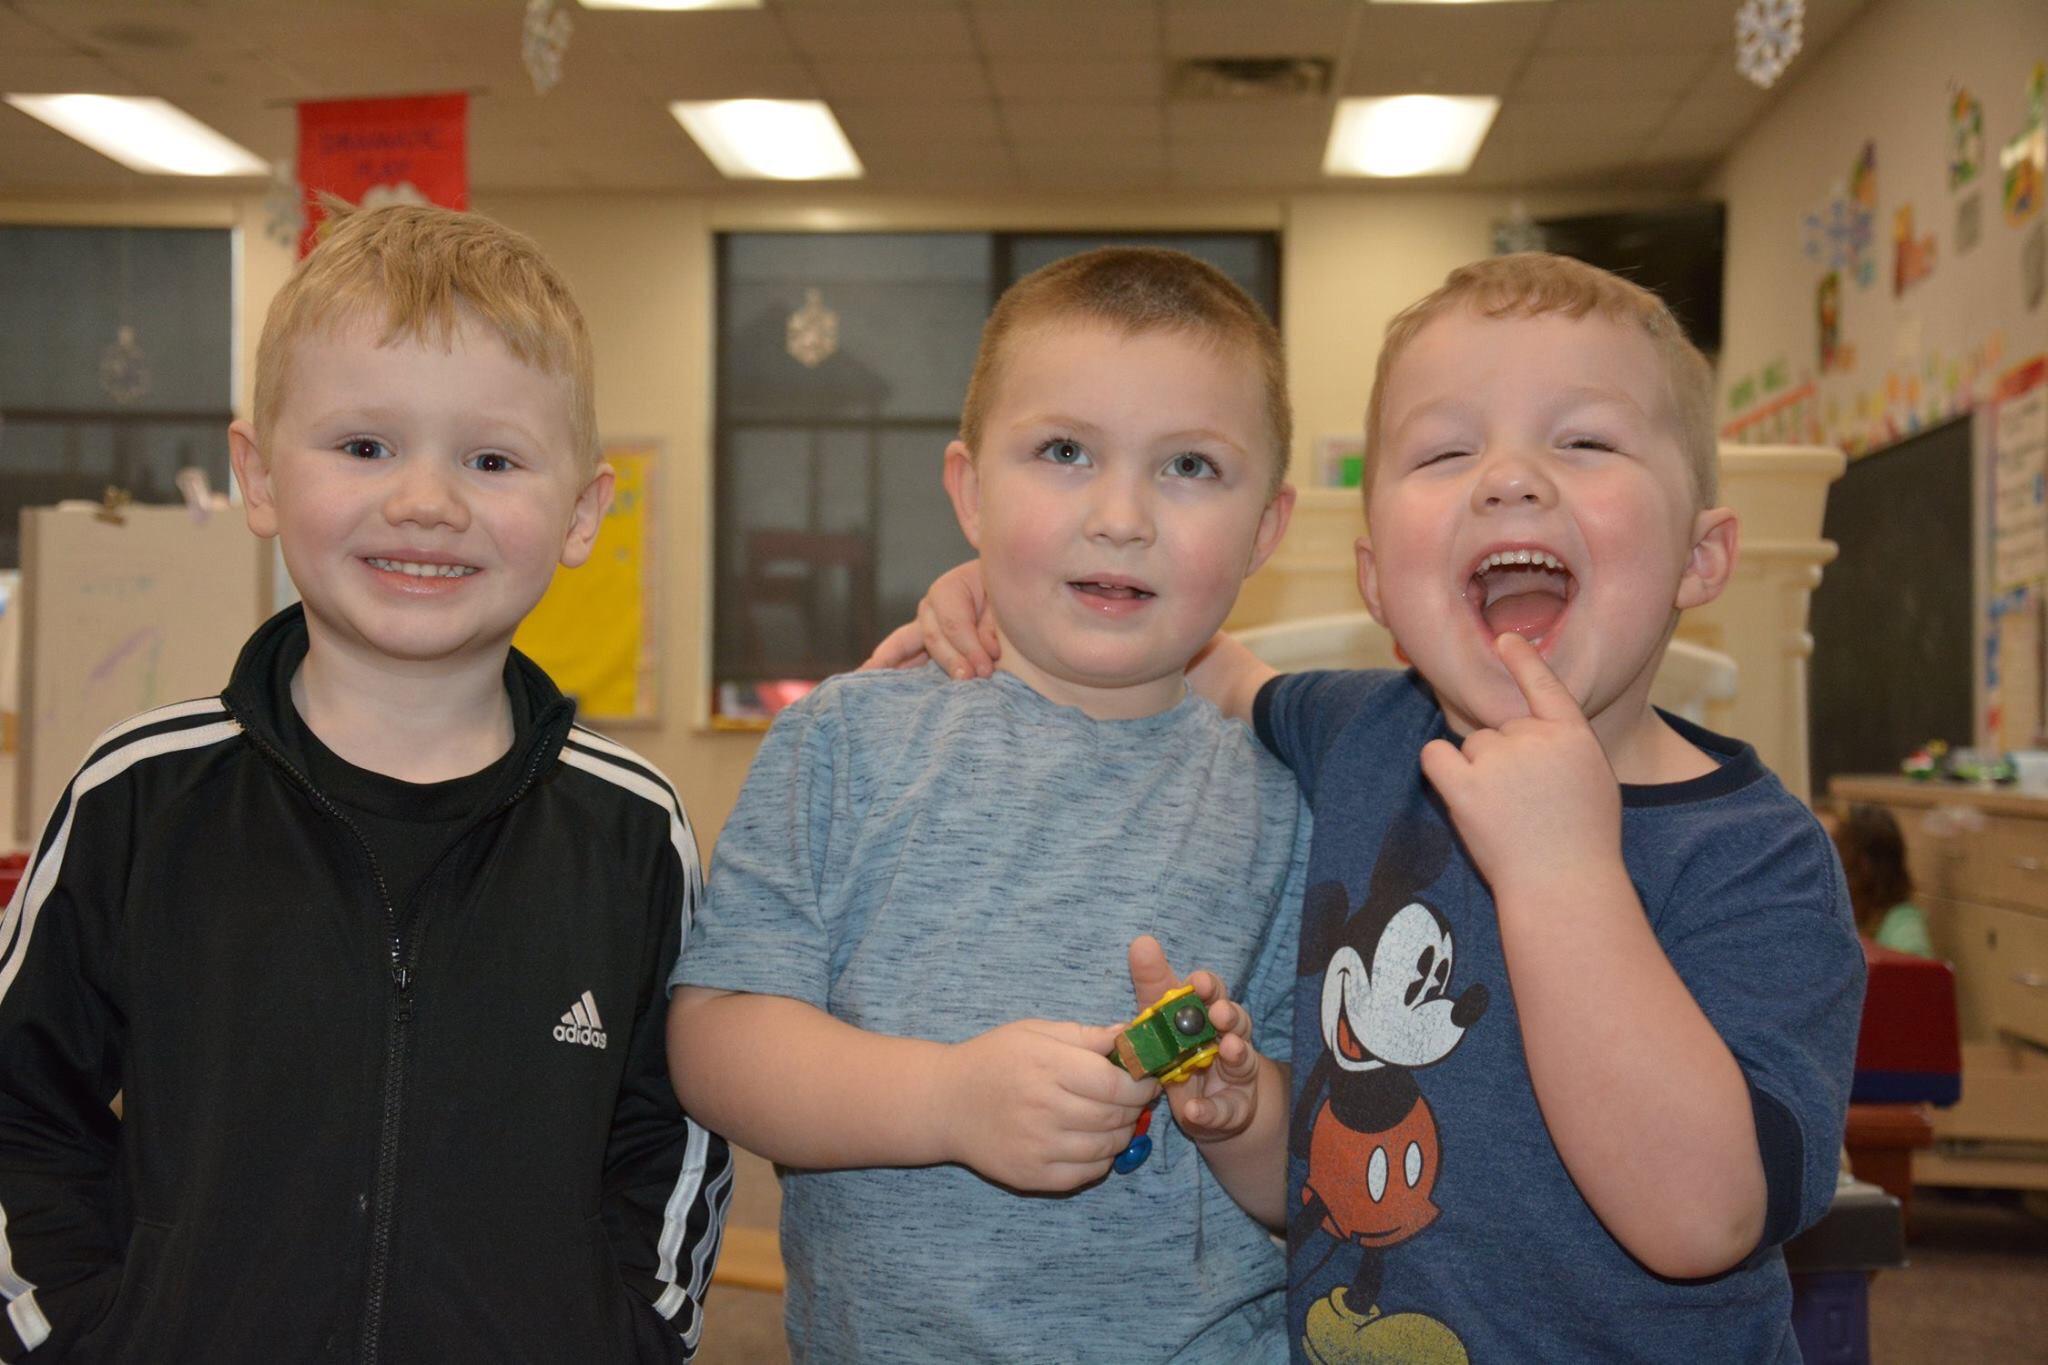 Preschool kids play together